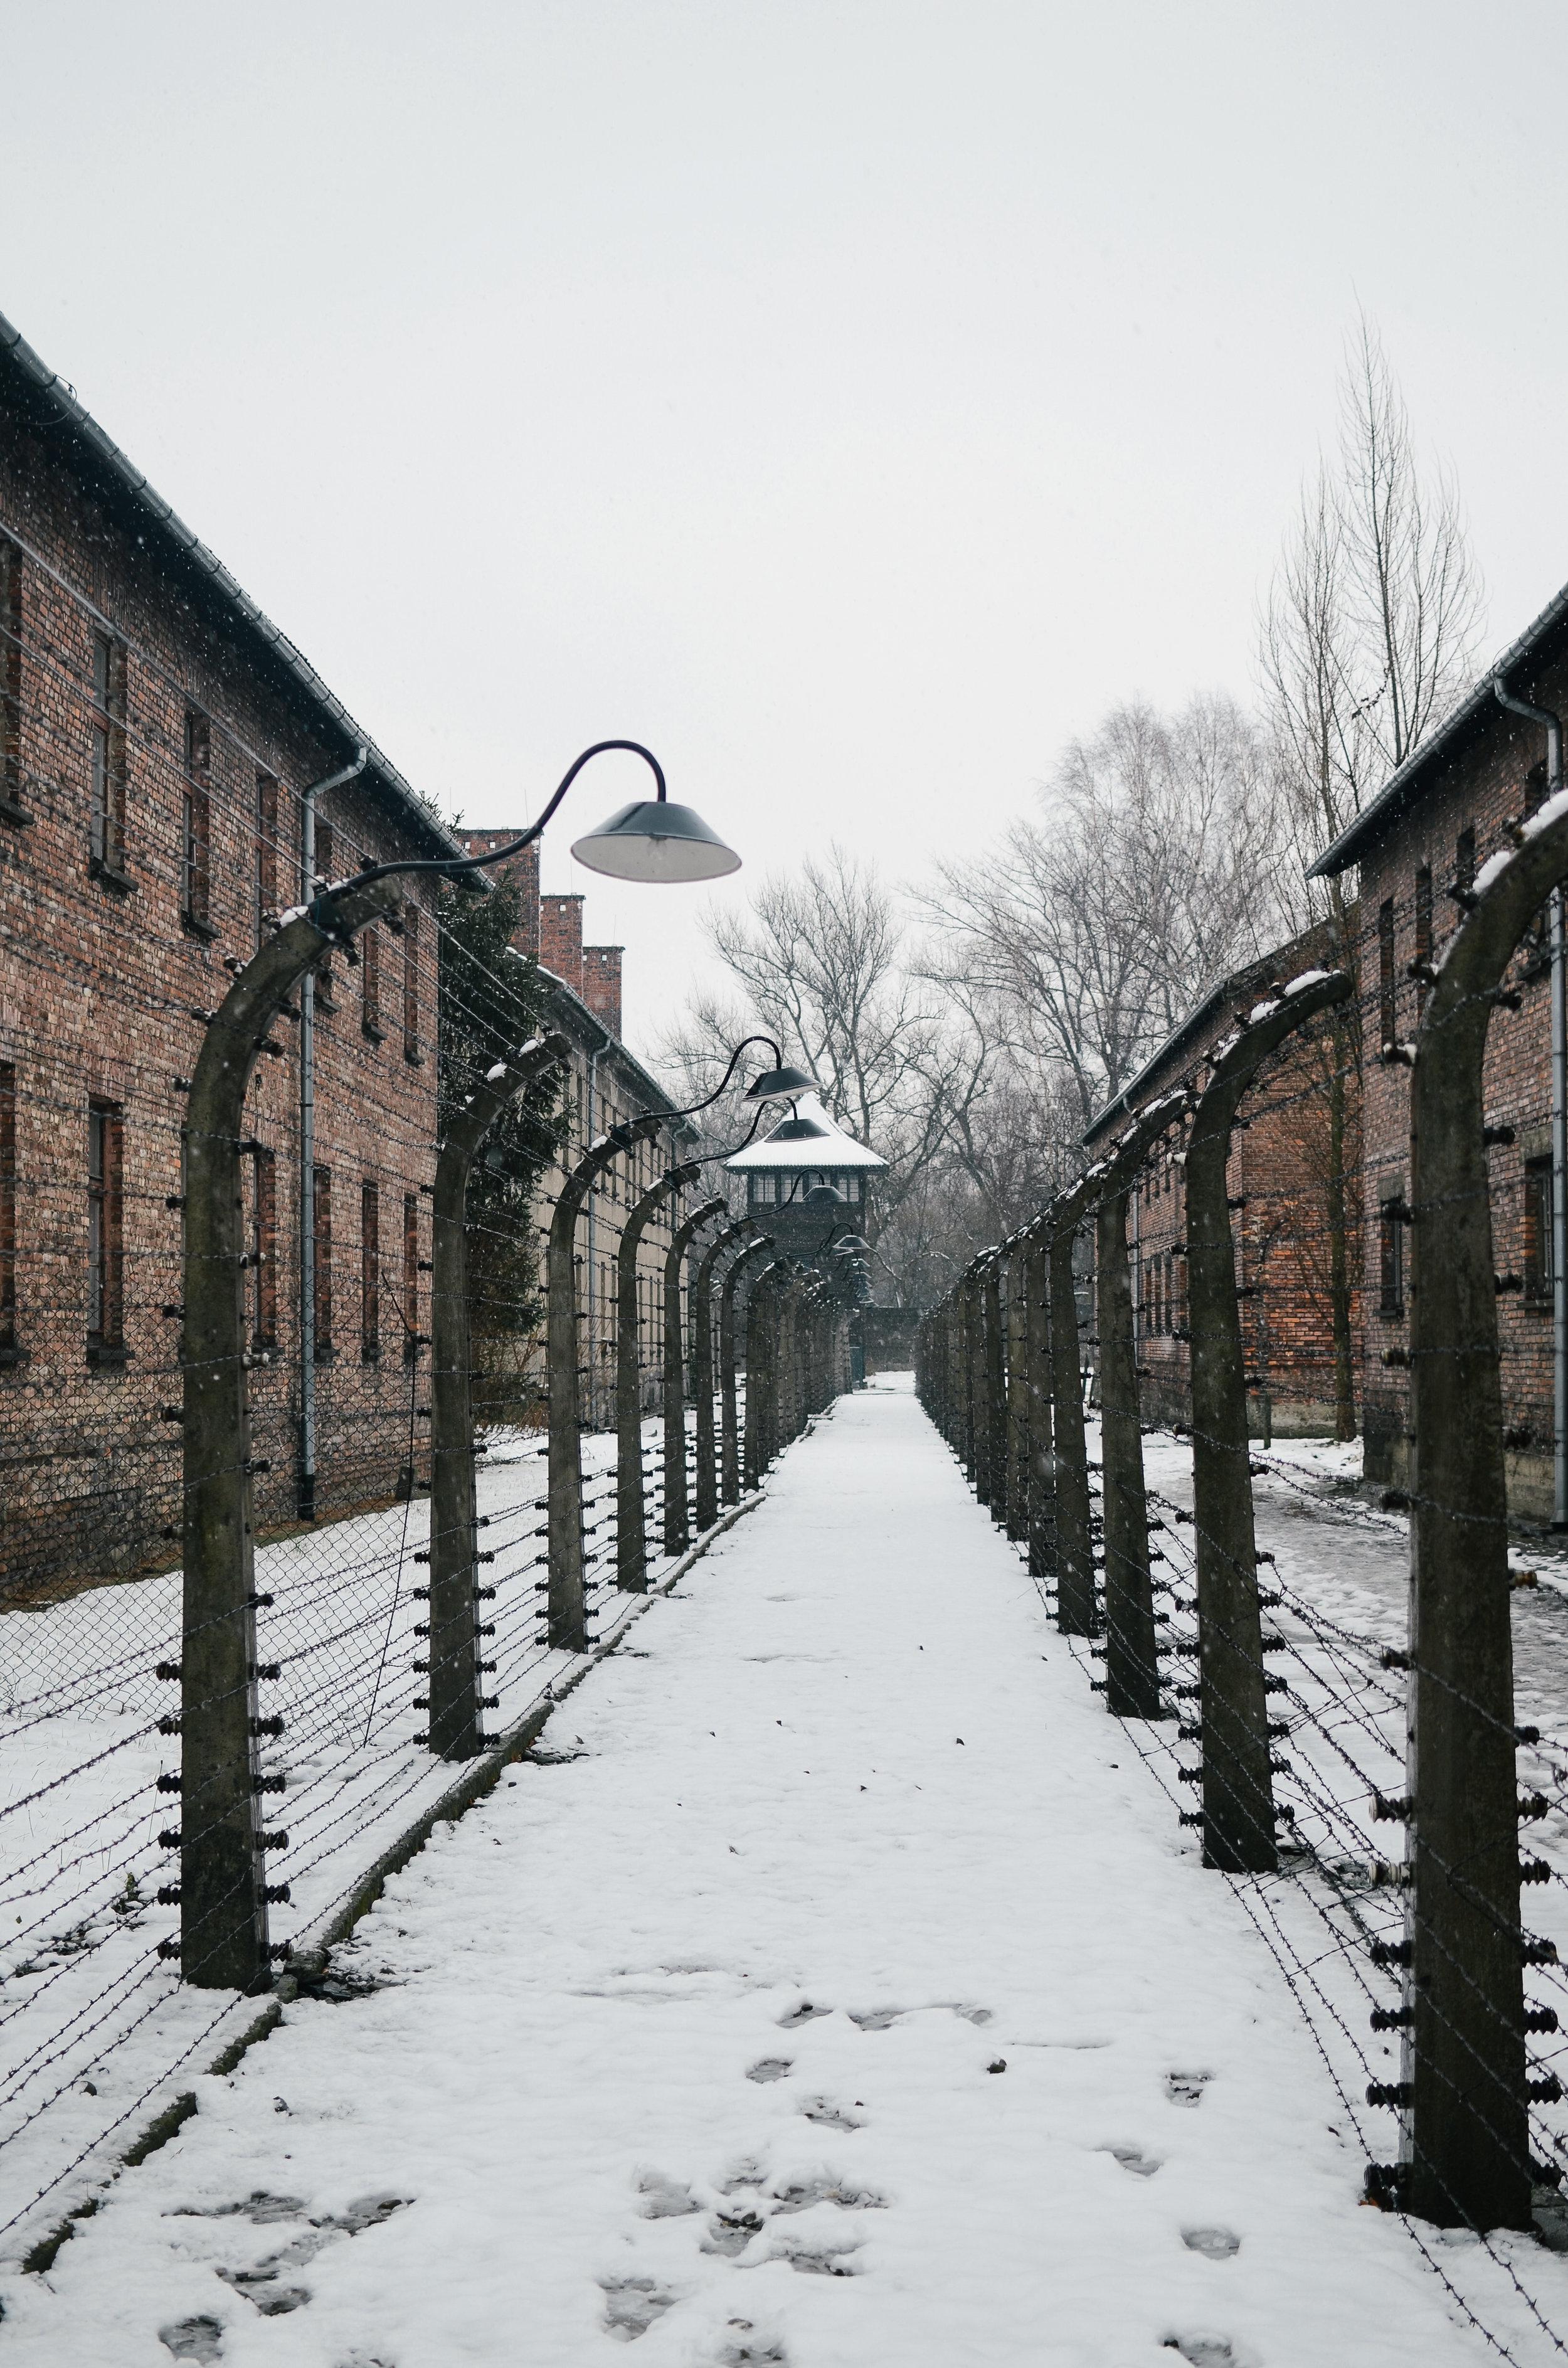 aushwitz-krakow-poland-travel-guide-lifeonpin_DSC_1028.jpg